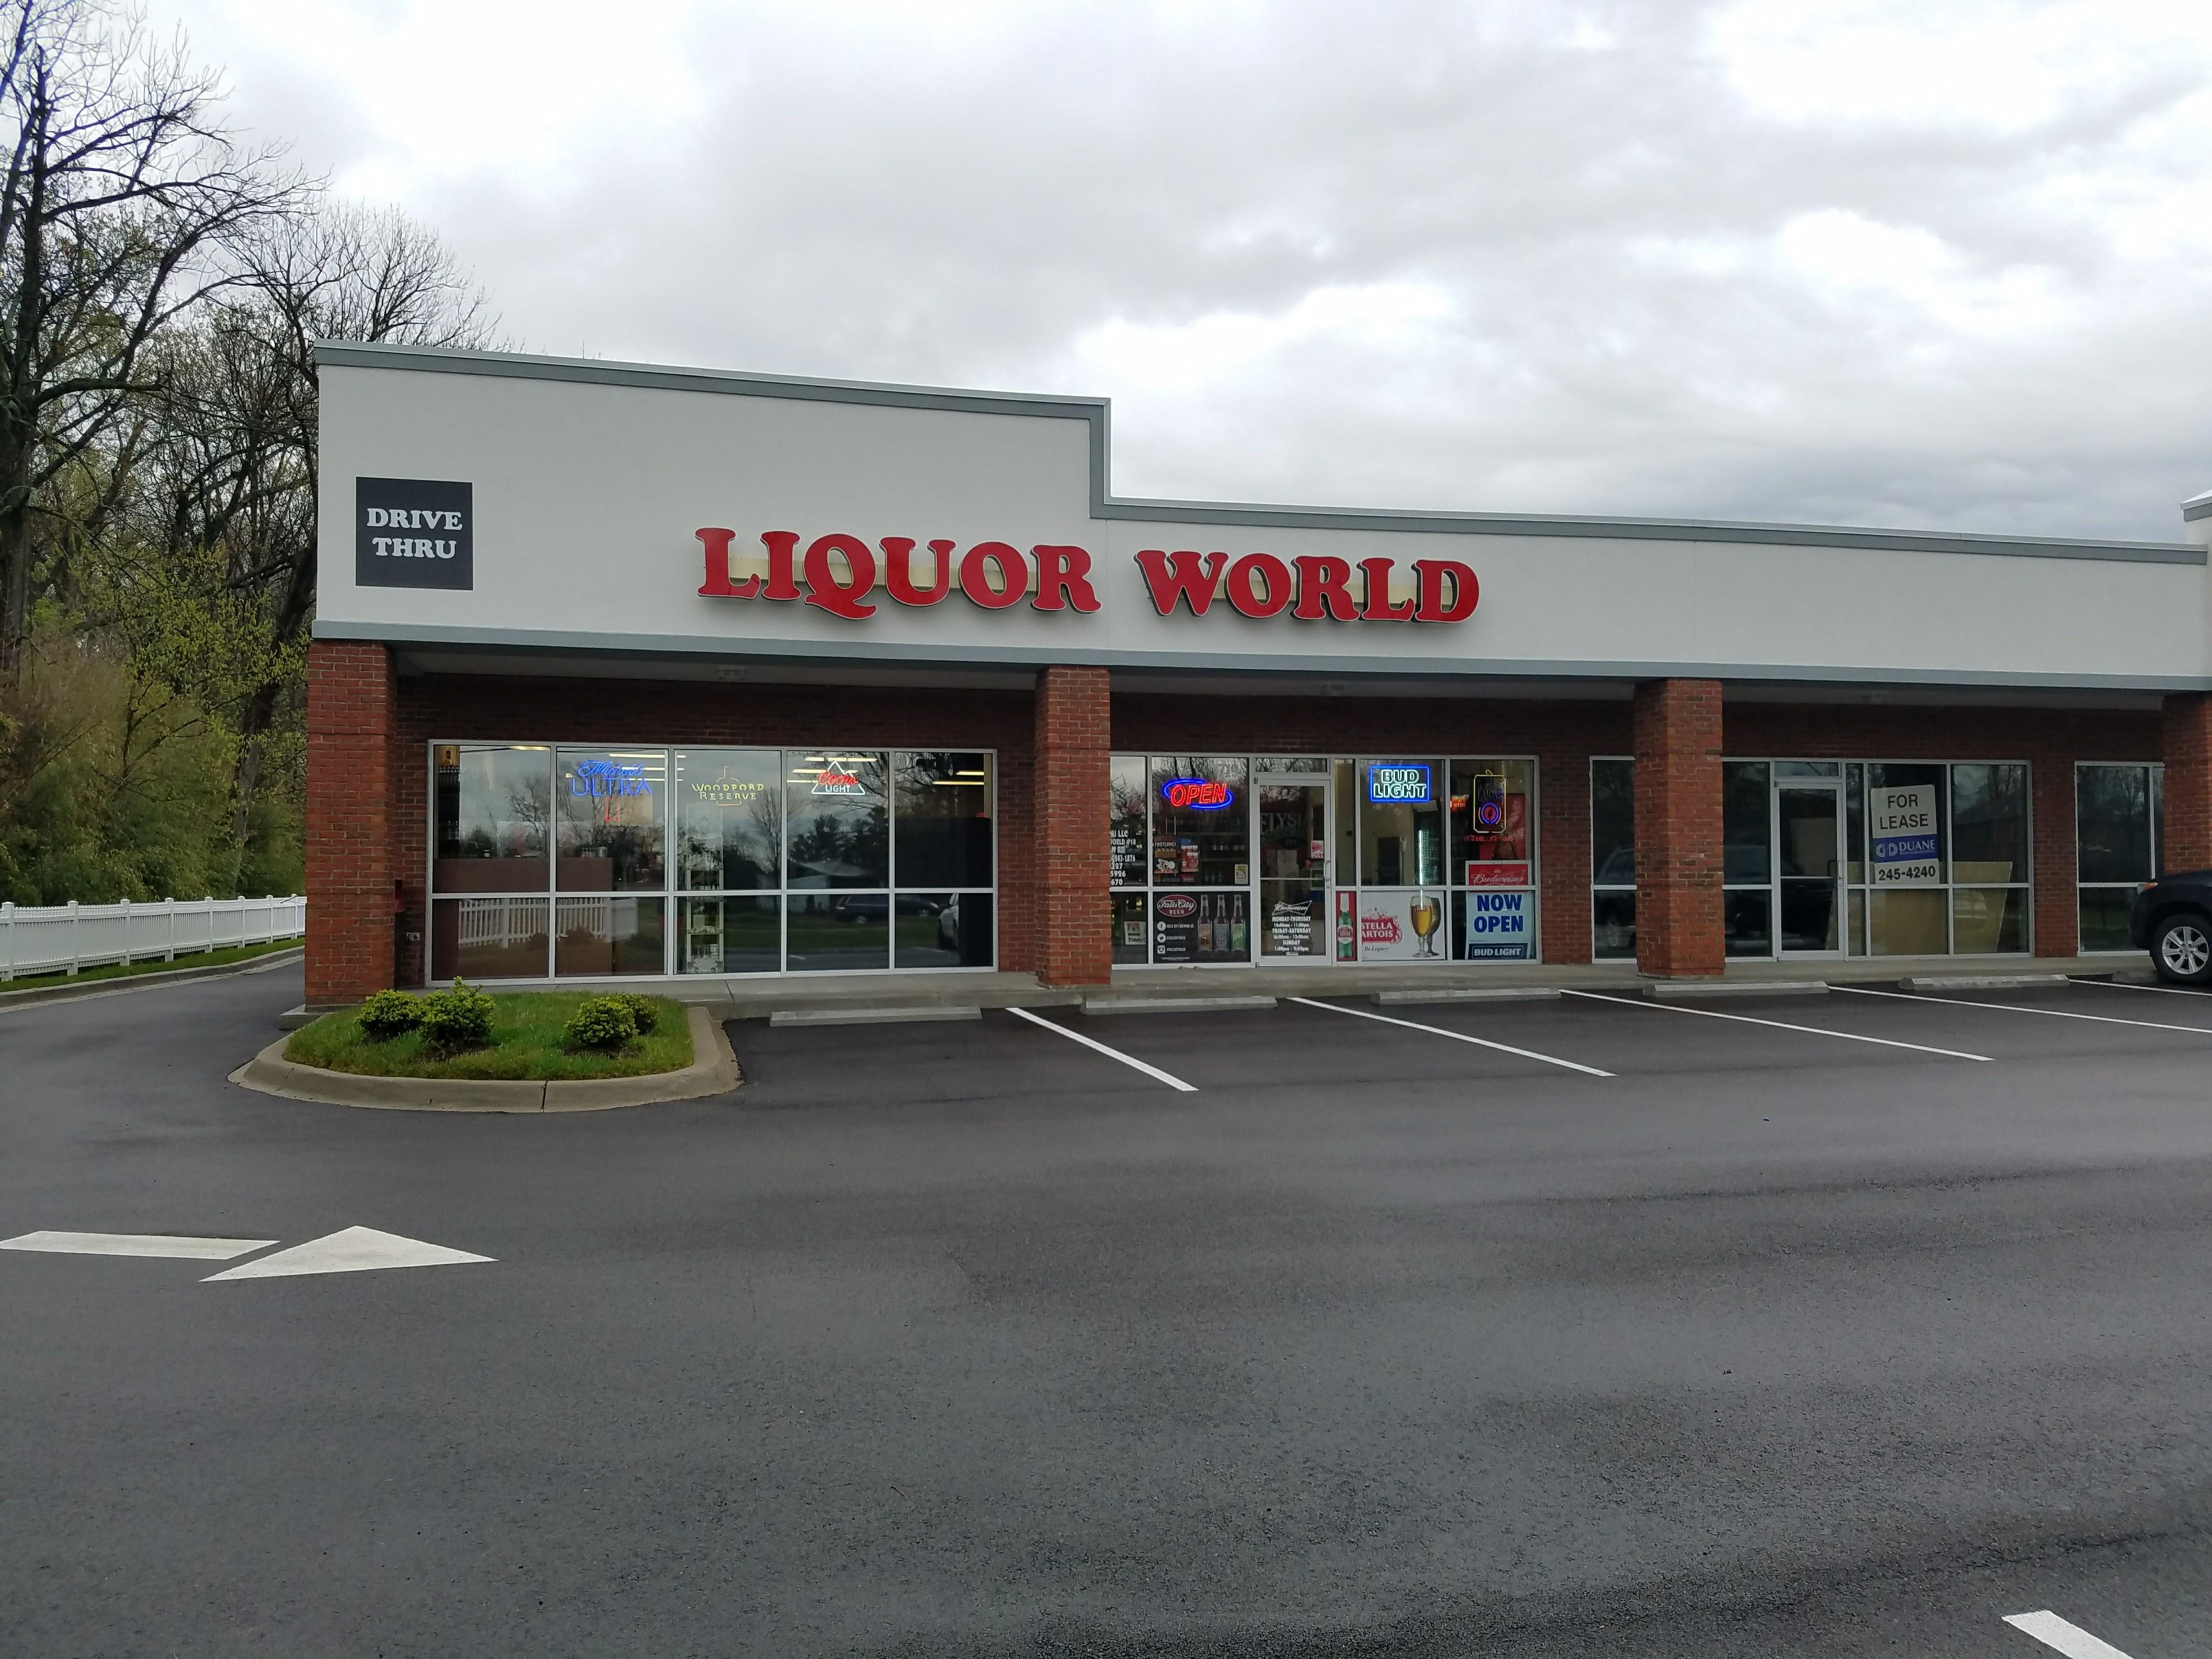 Liquor World image 10